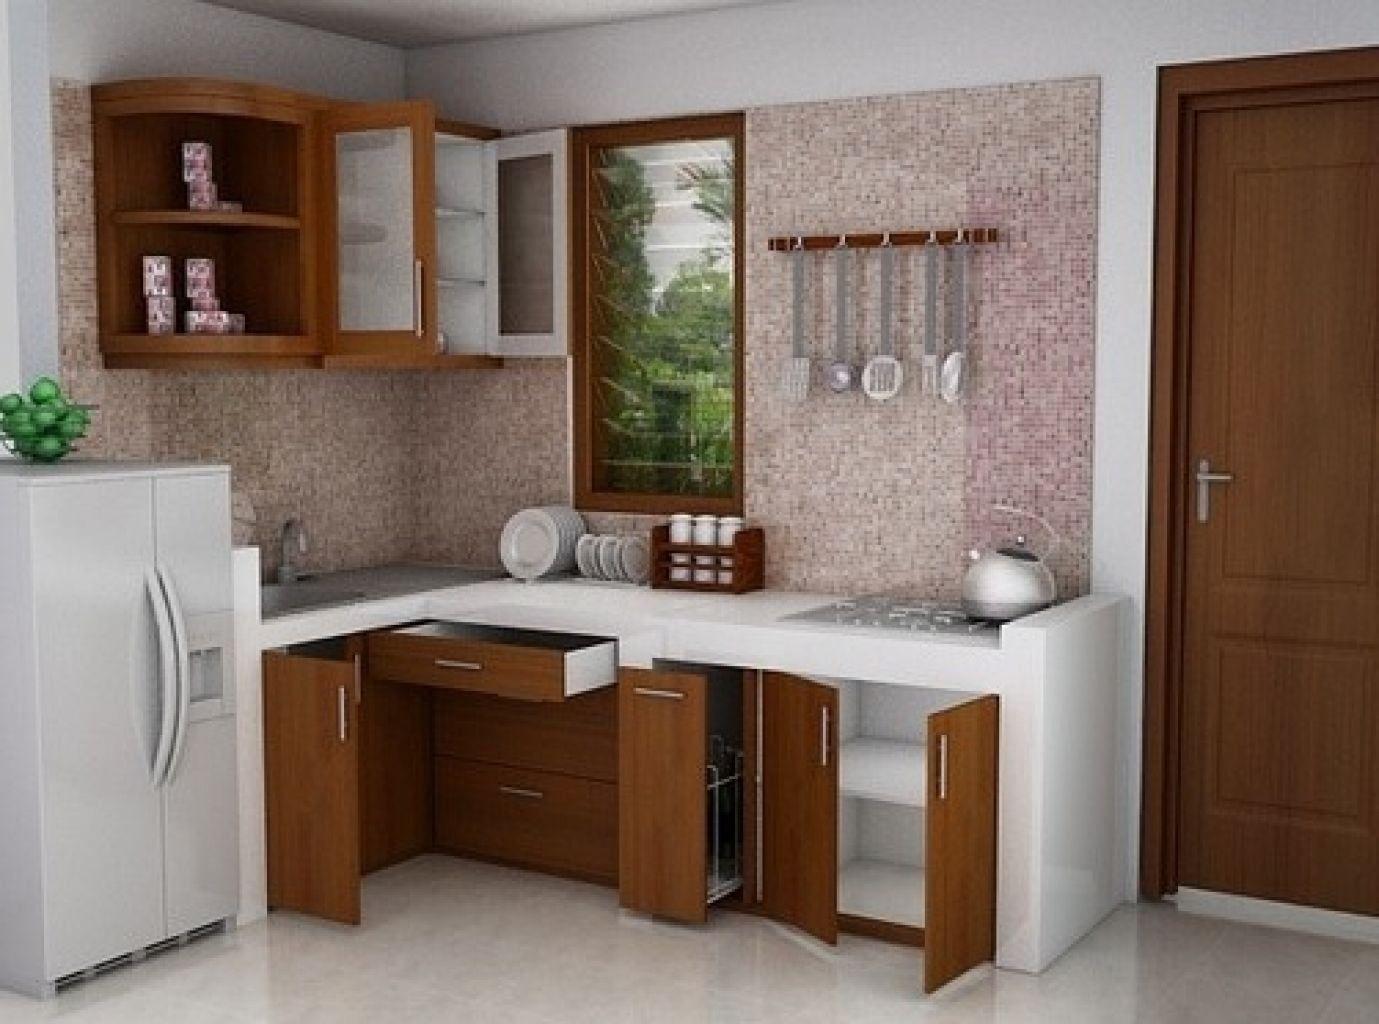 Desain Model Dapur Modern Minimalis